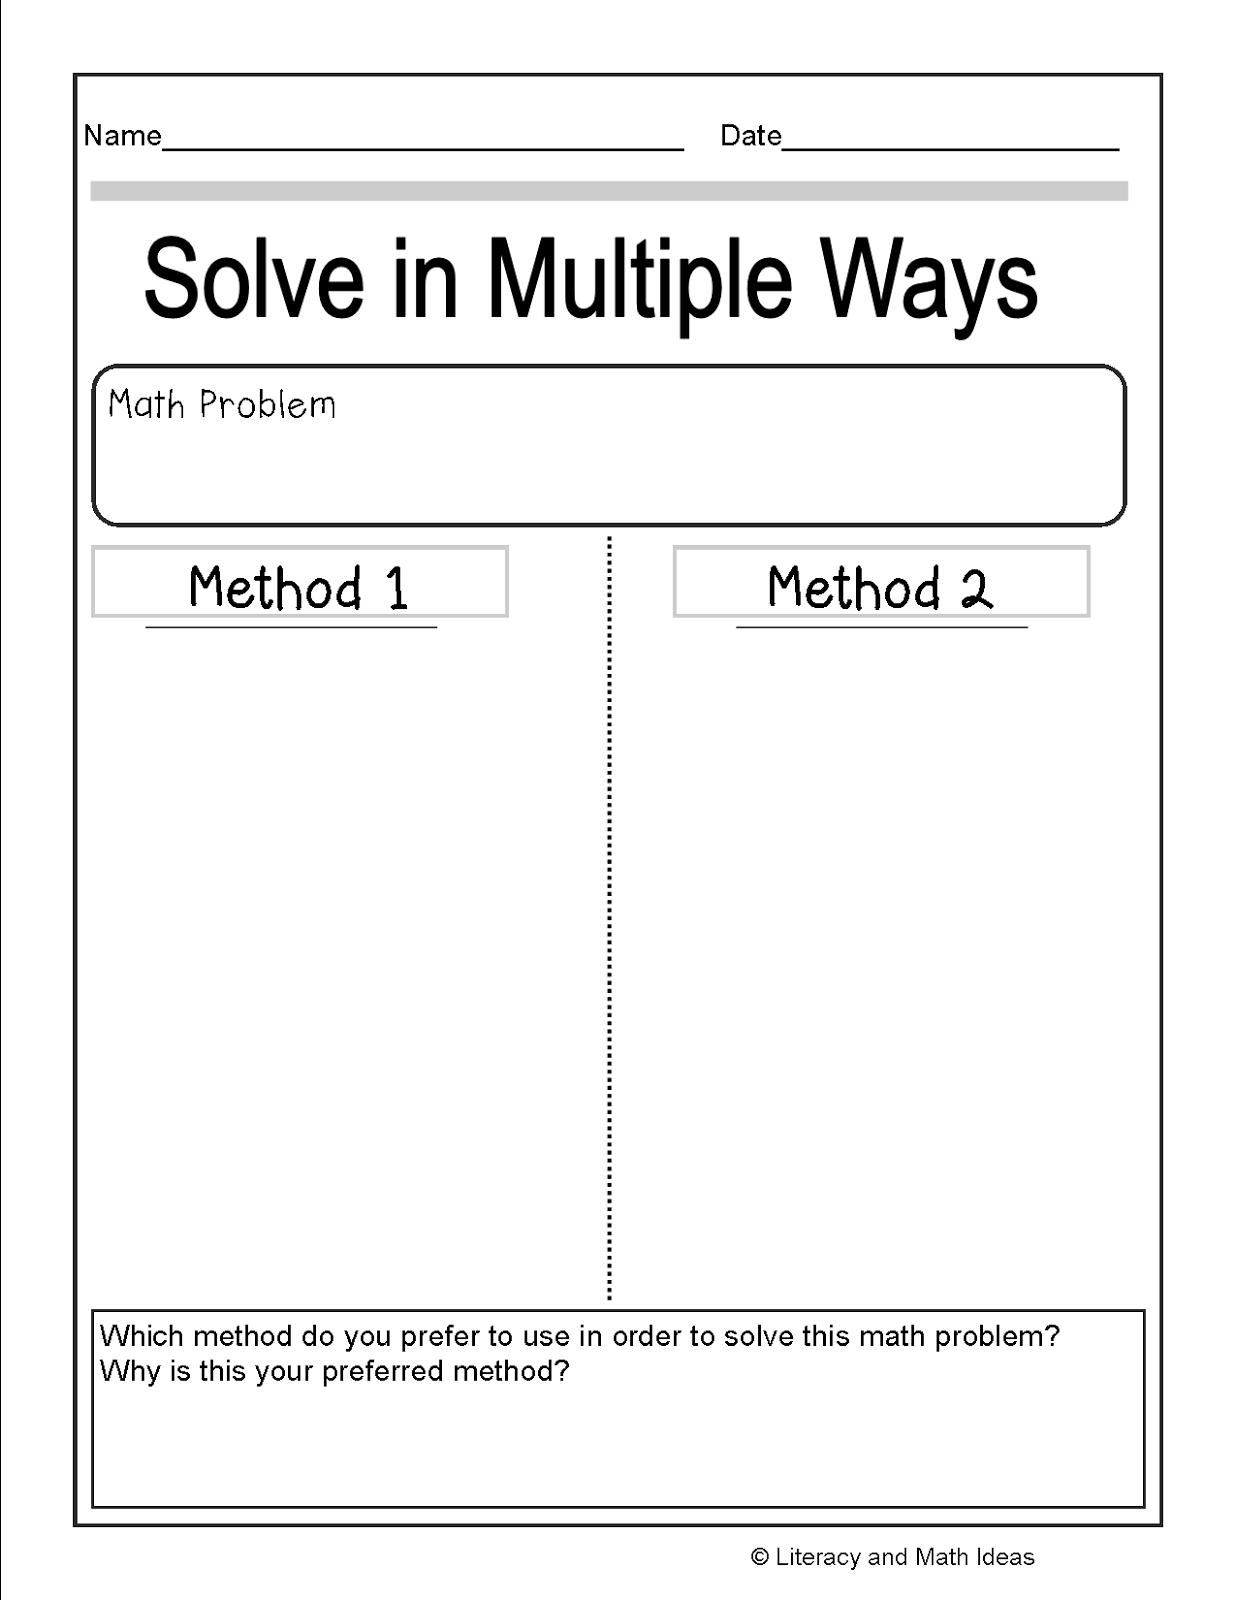 Literacy Amp Math Ideas Solve Math Problems In Multiple Ways